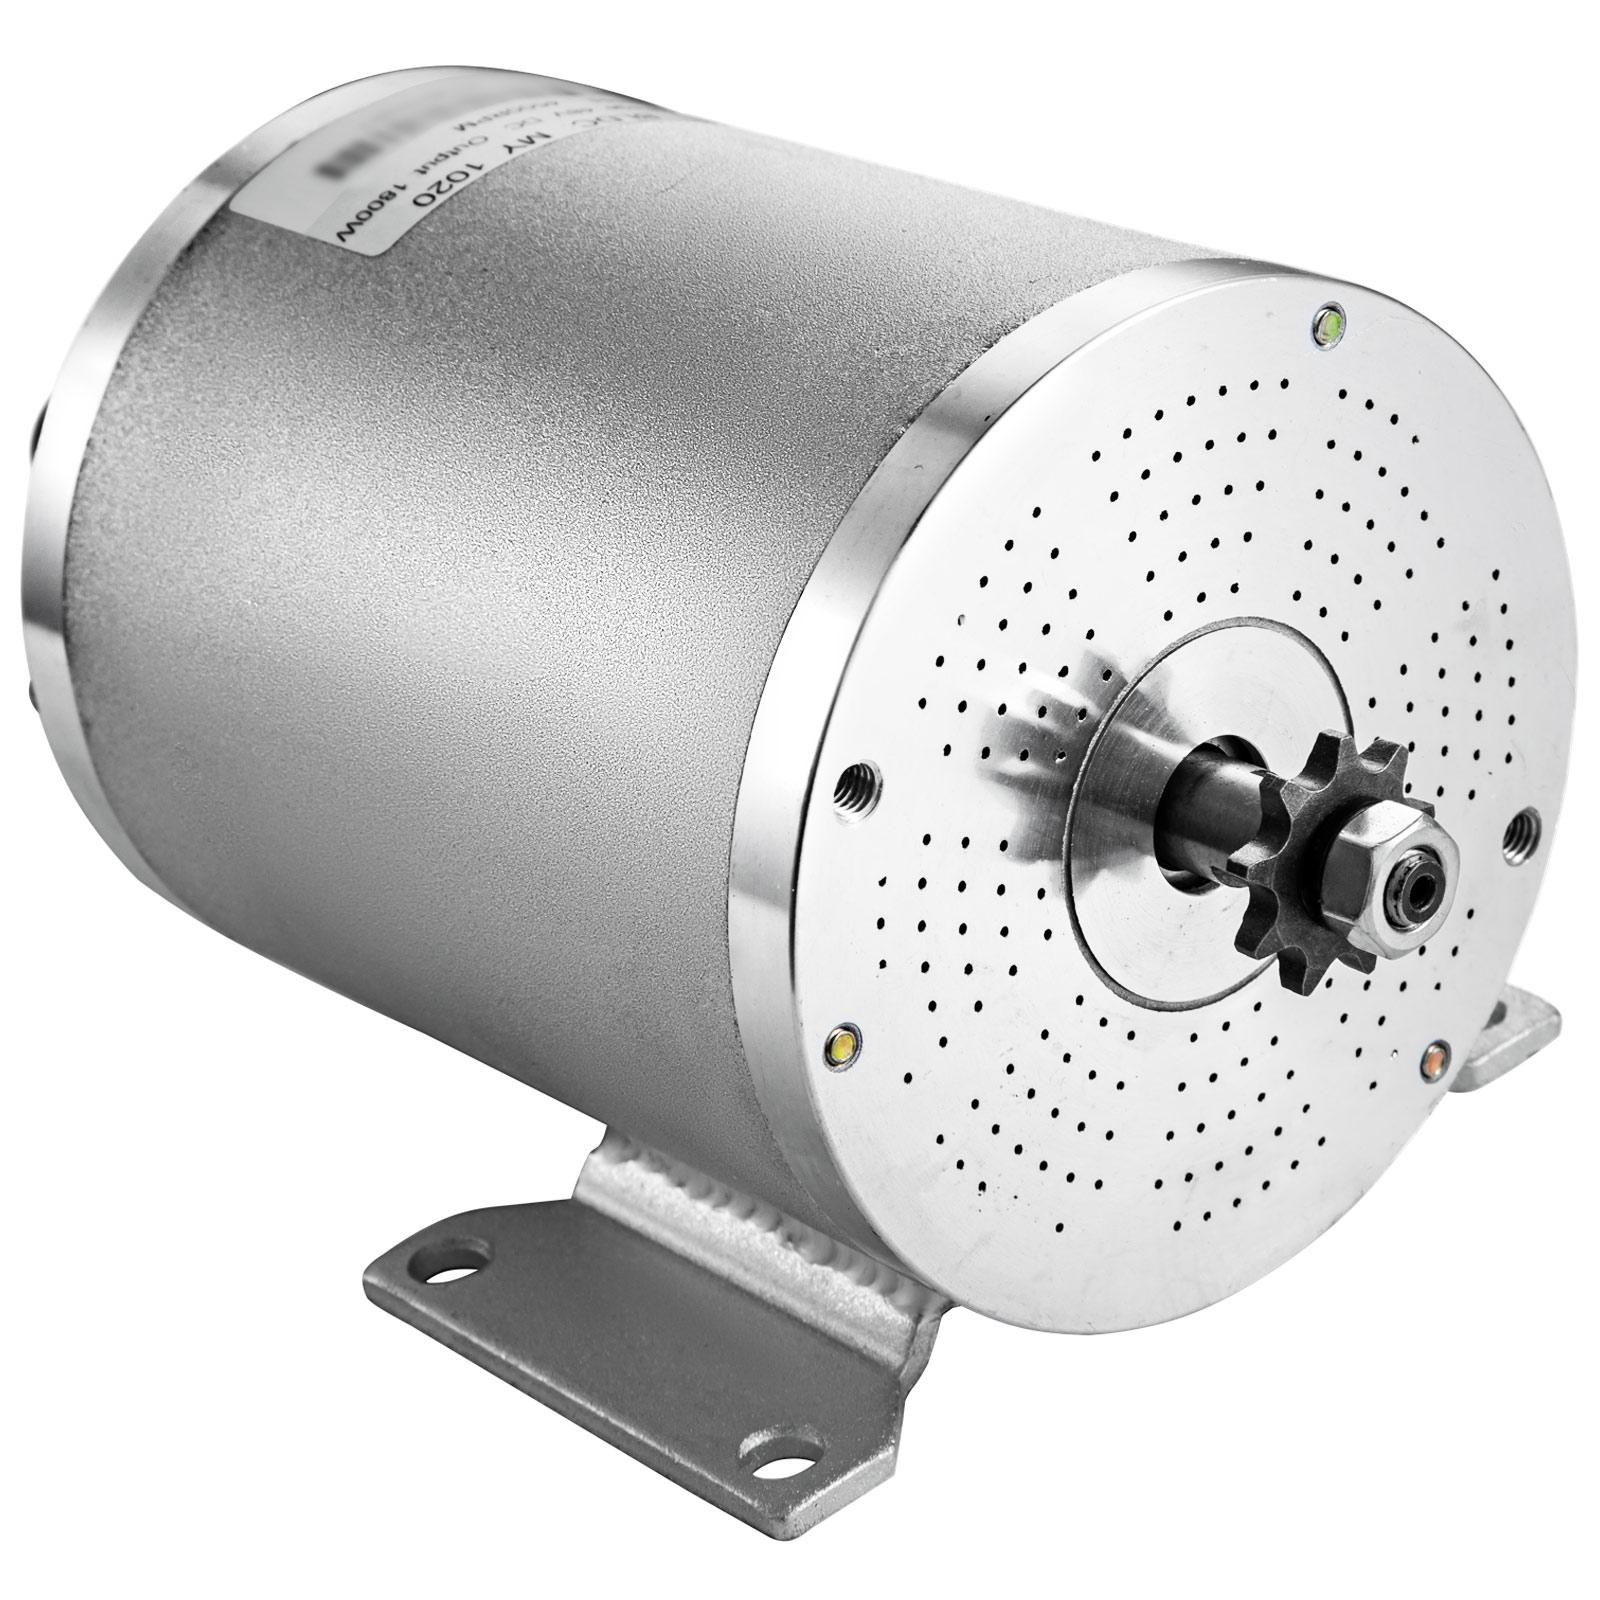 1800W-48V-DC-Brushless-Electric-Motor-Kit-f-Scooter-500-1800W-E-Bike-Go-Kart thumbnail 240